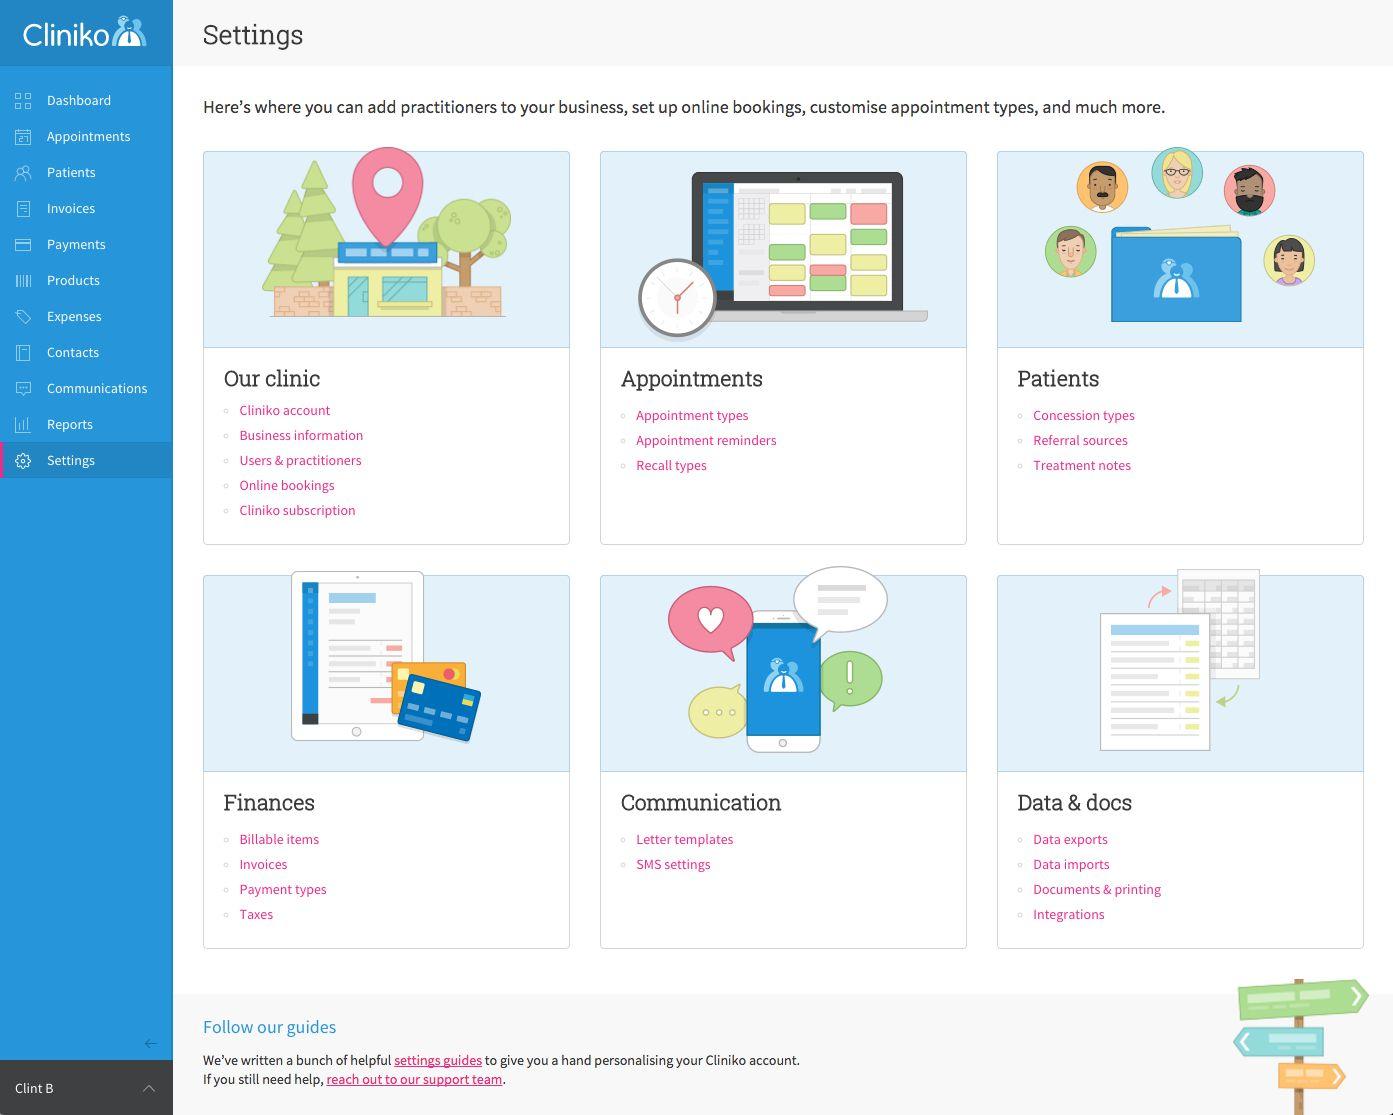 Cliniko's settings page